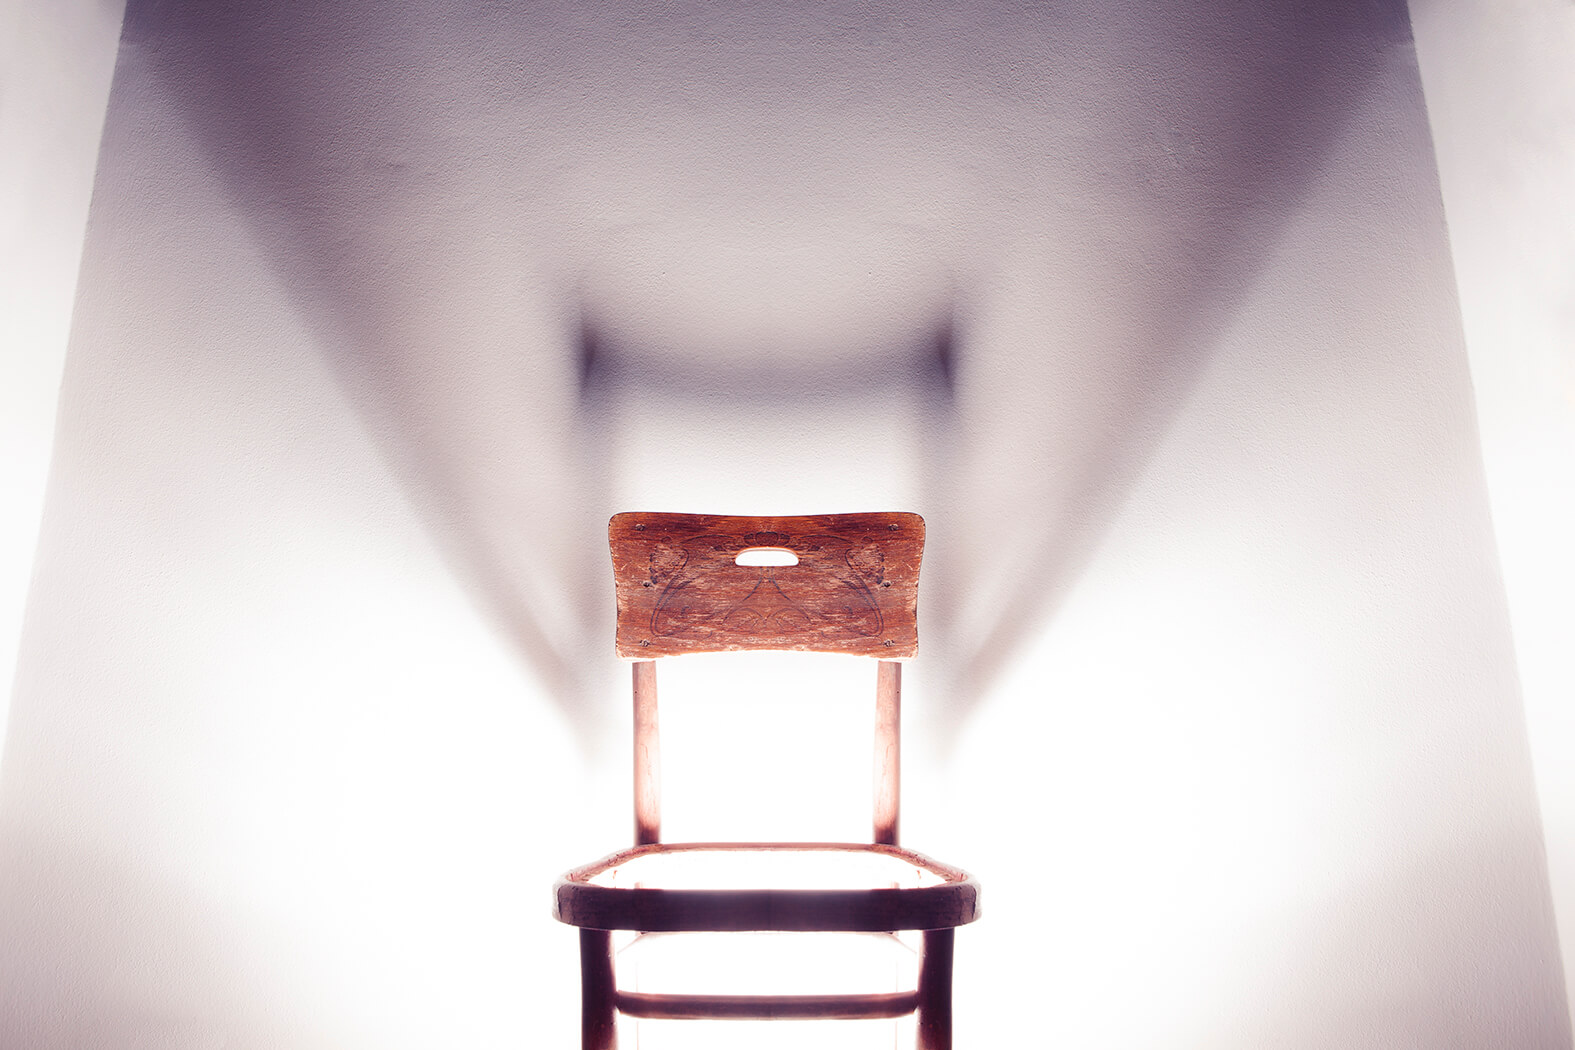 LIFE VEST UNDER YOUR SEAT                               (capitolo secondo)